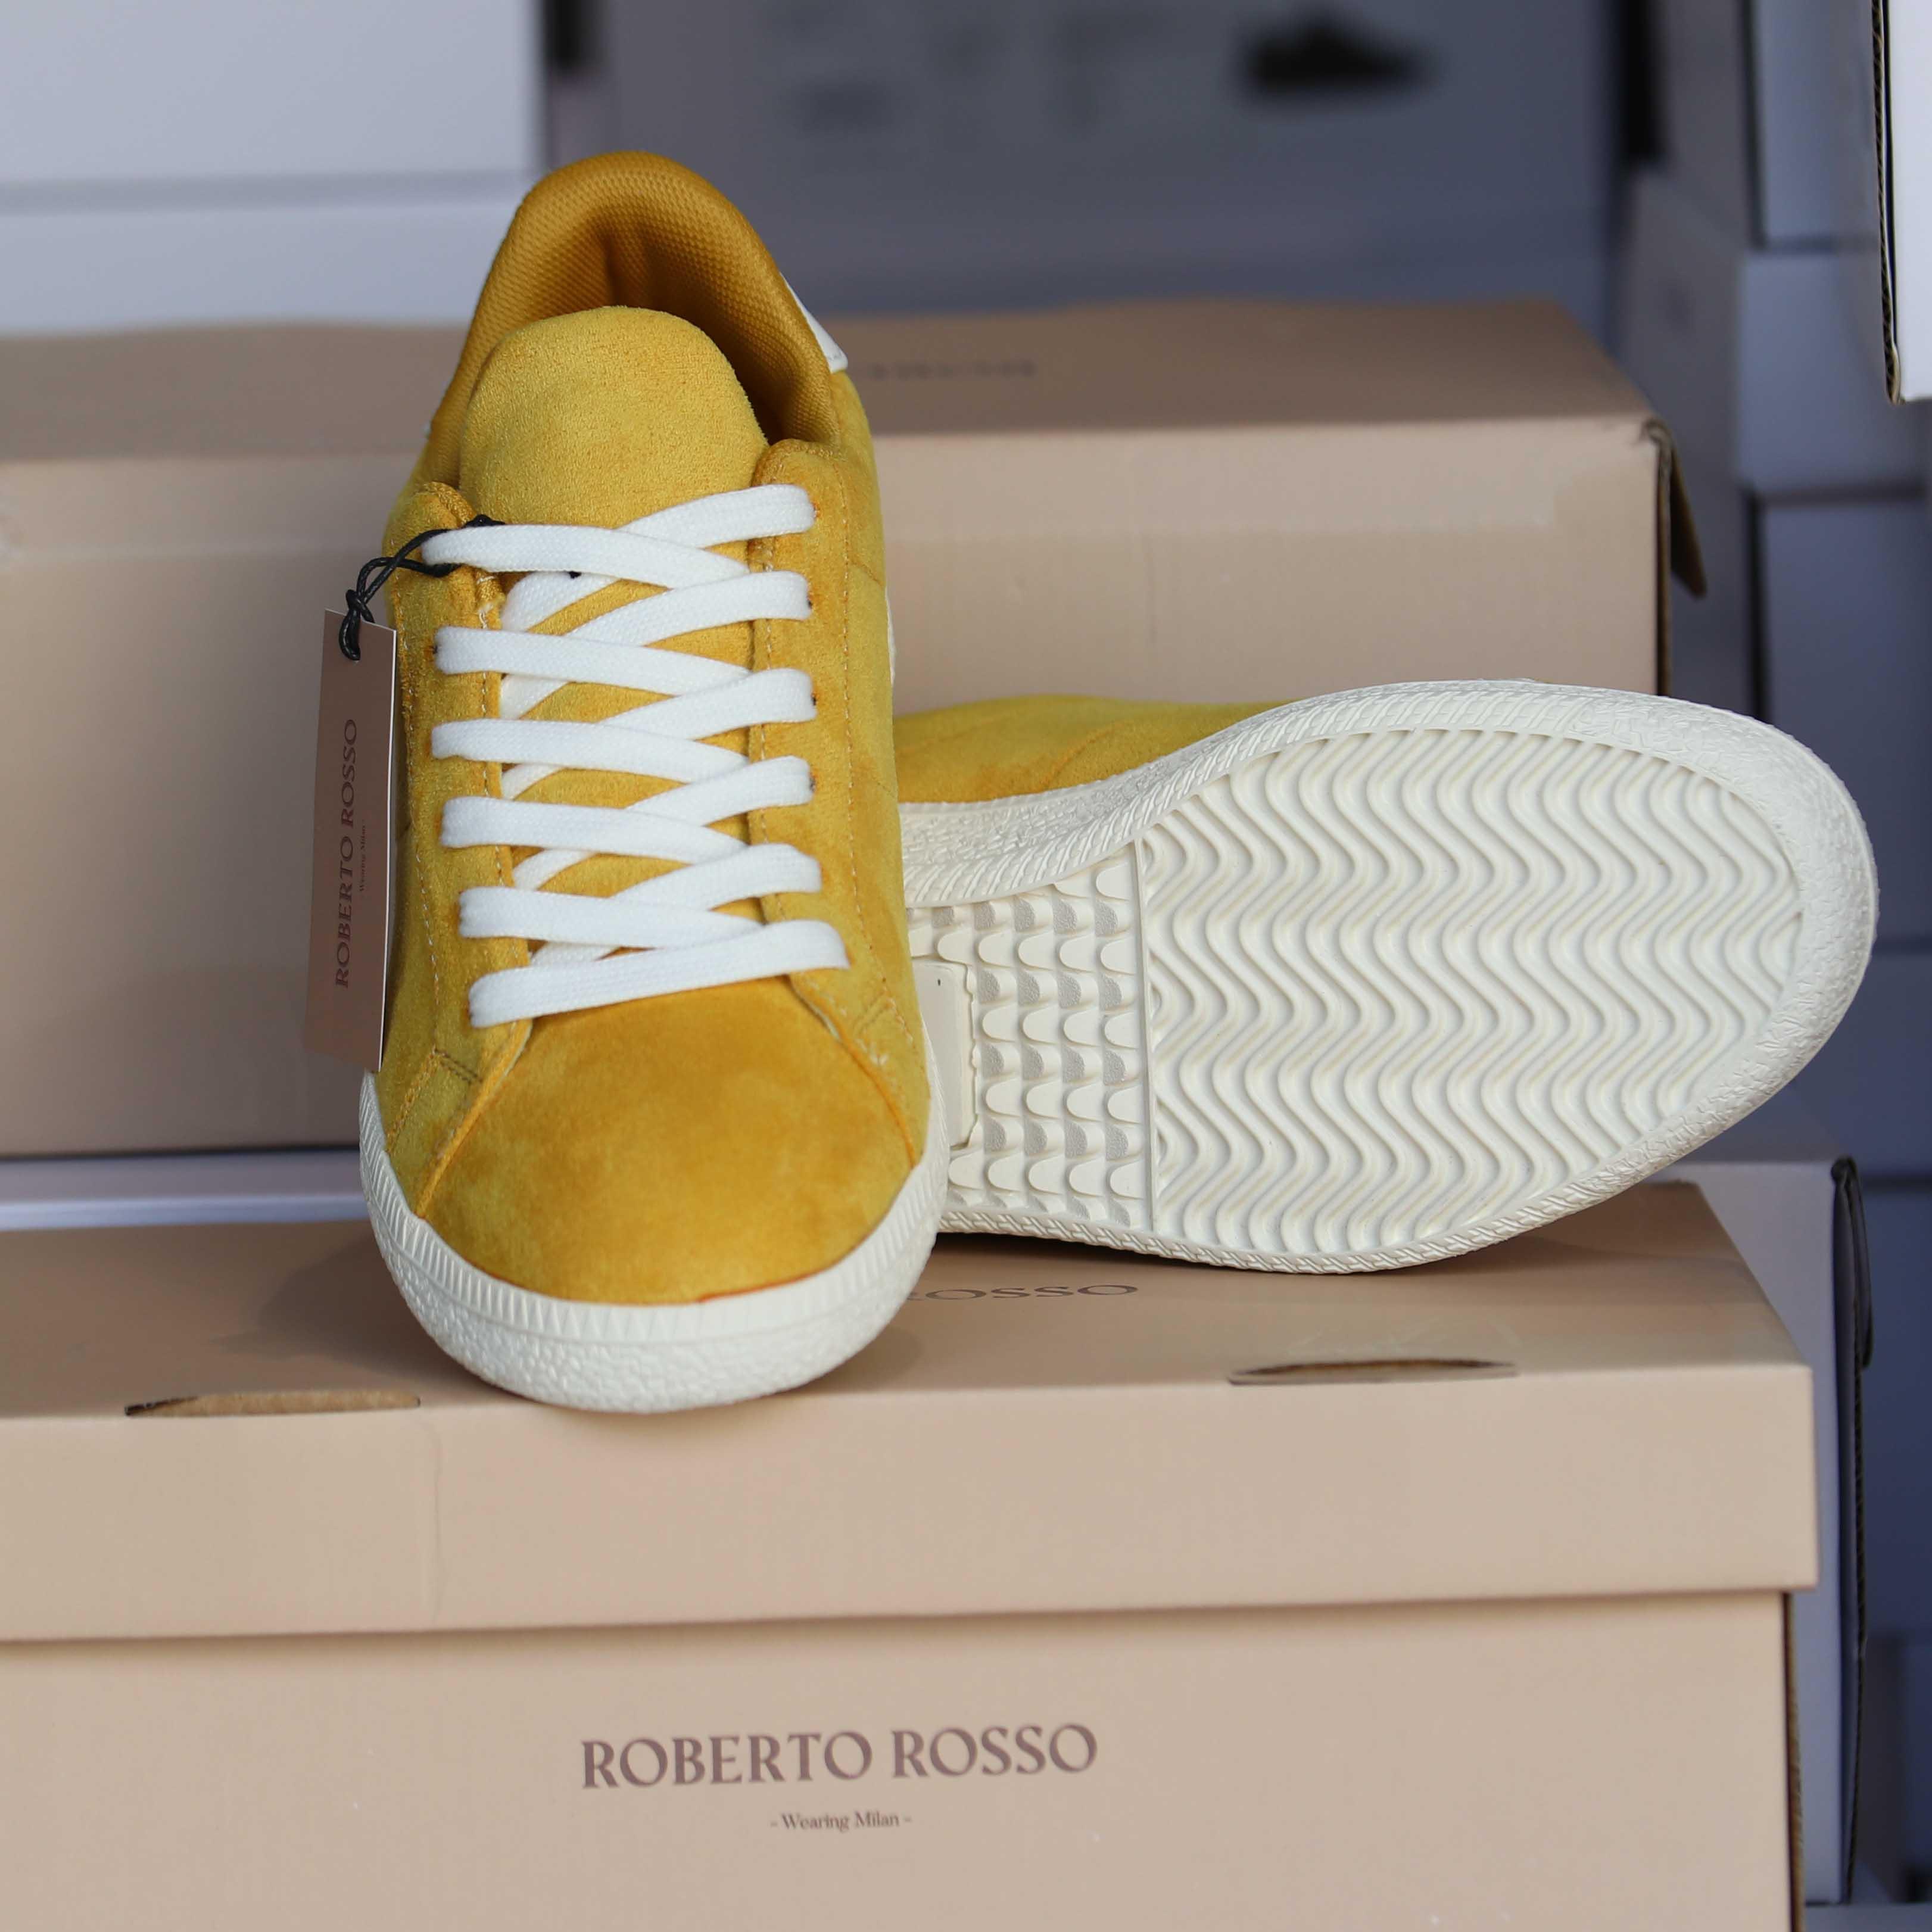 roberto rosso portiva yellow dame sko sommer2